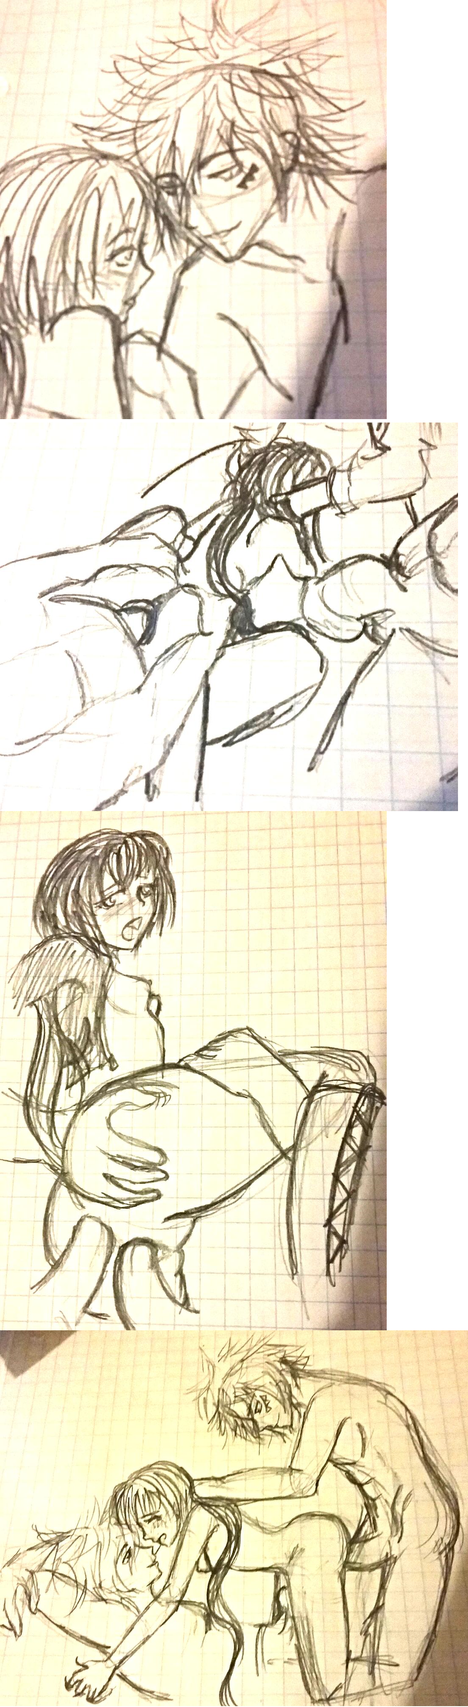 Byakuran x Yuni mature sketch dump by IllusionedTime